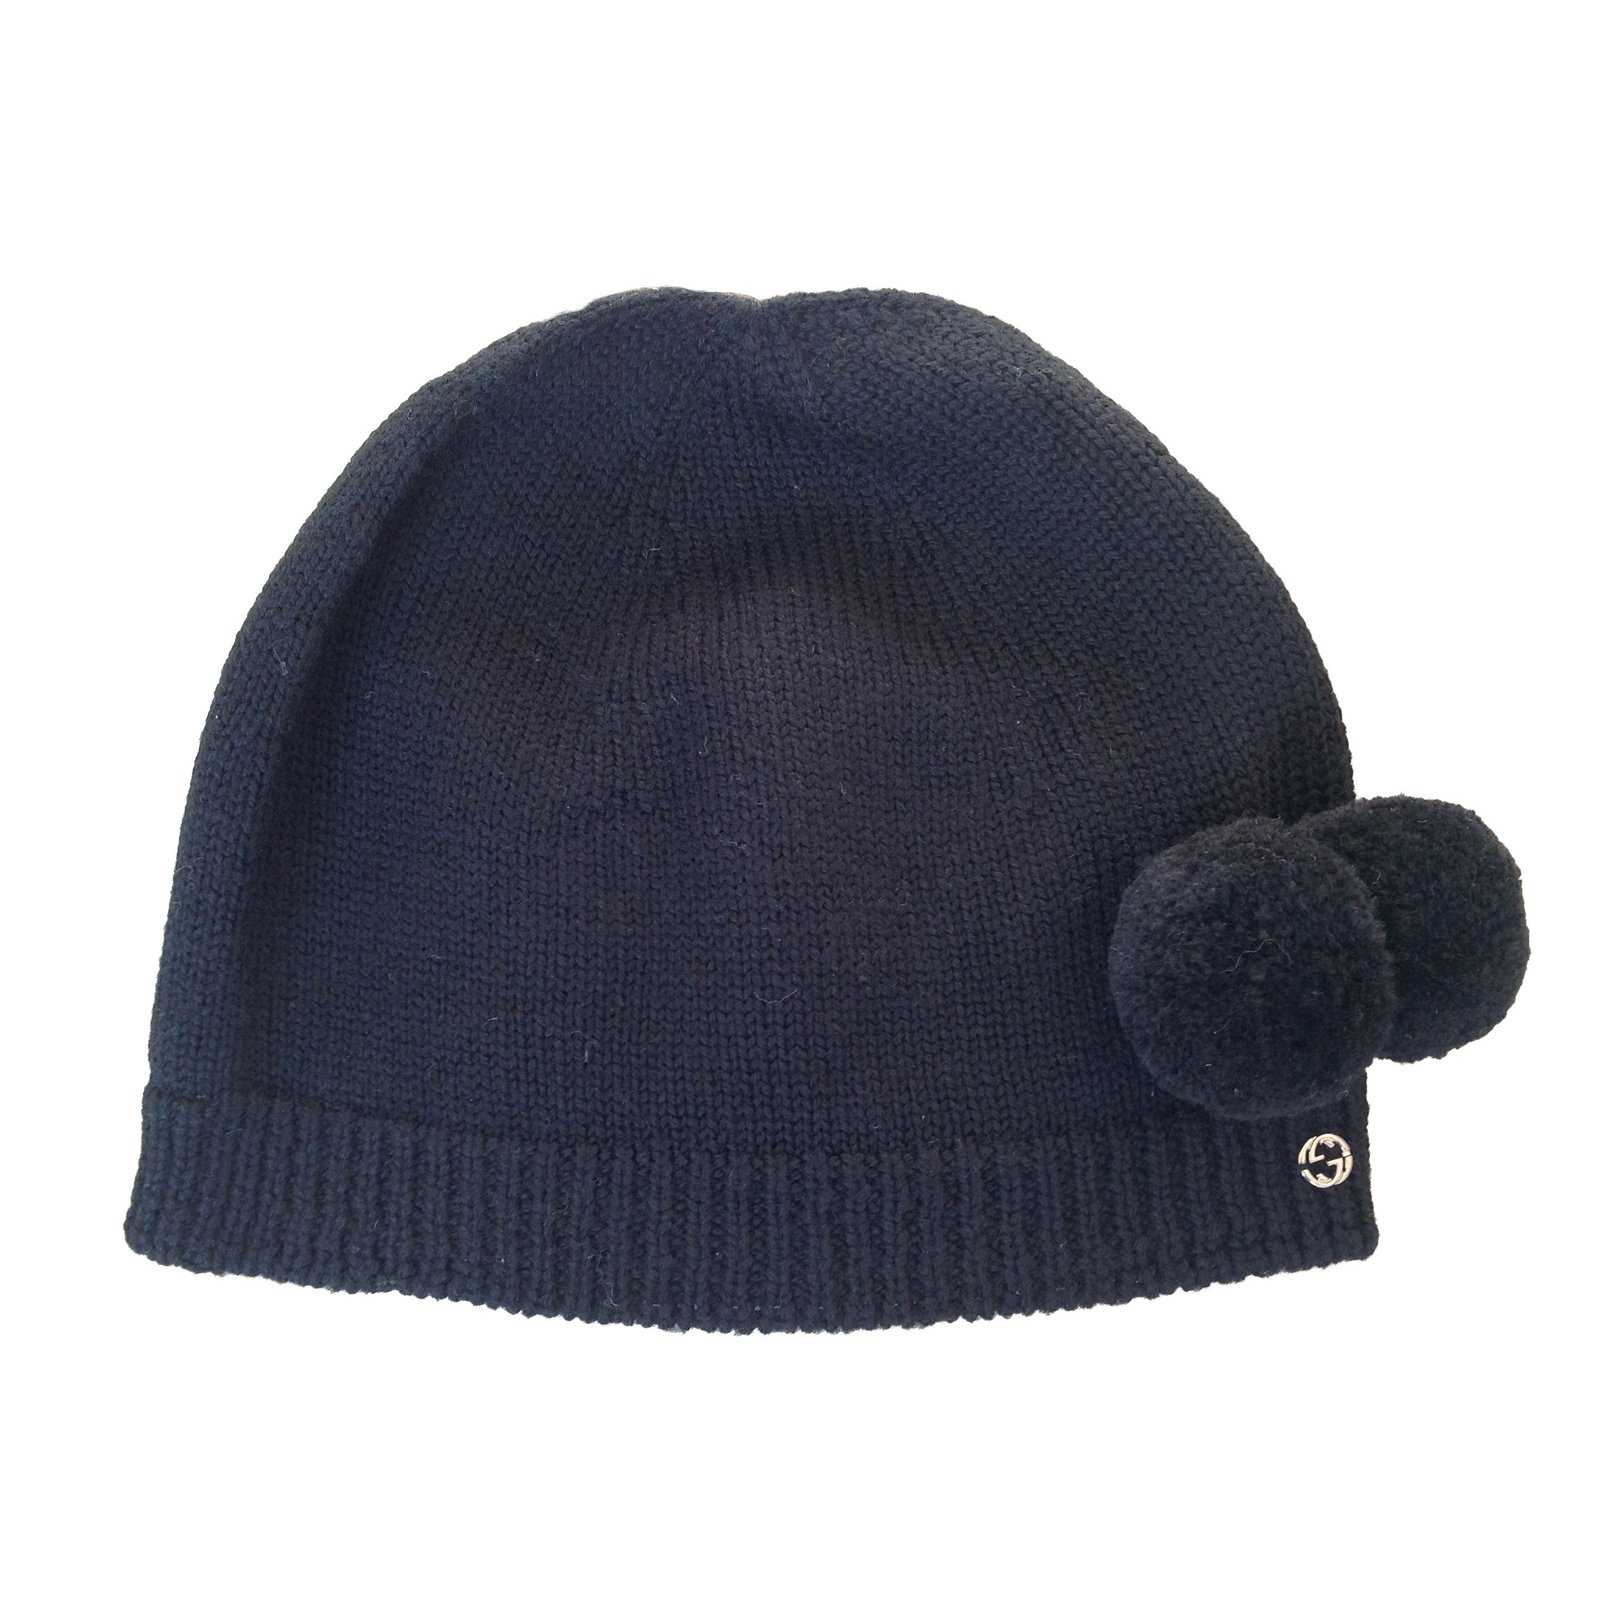 9ea71dde8a6 Gucci Gucci wool hat Hats Wool Black ref.47393 - Joli Closet